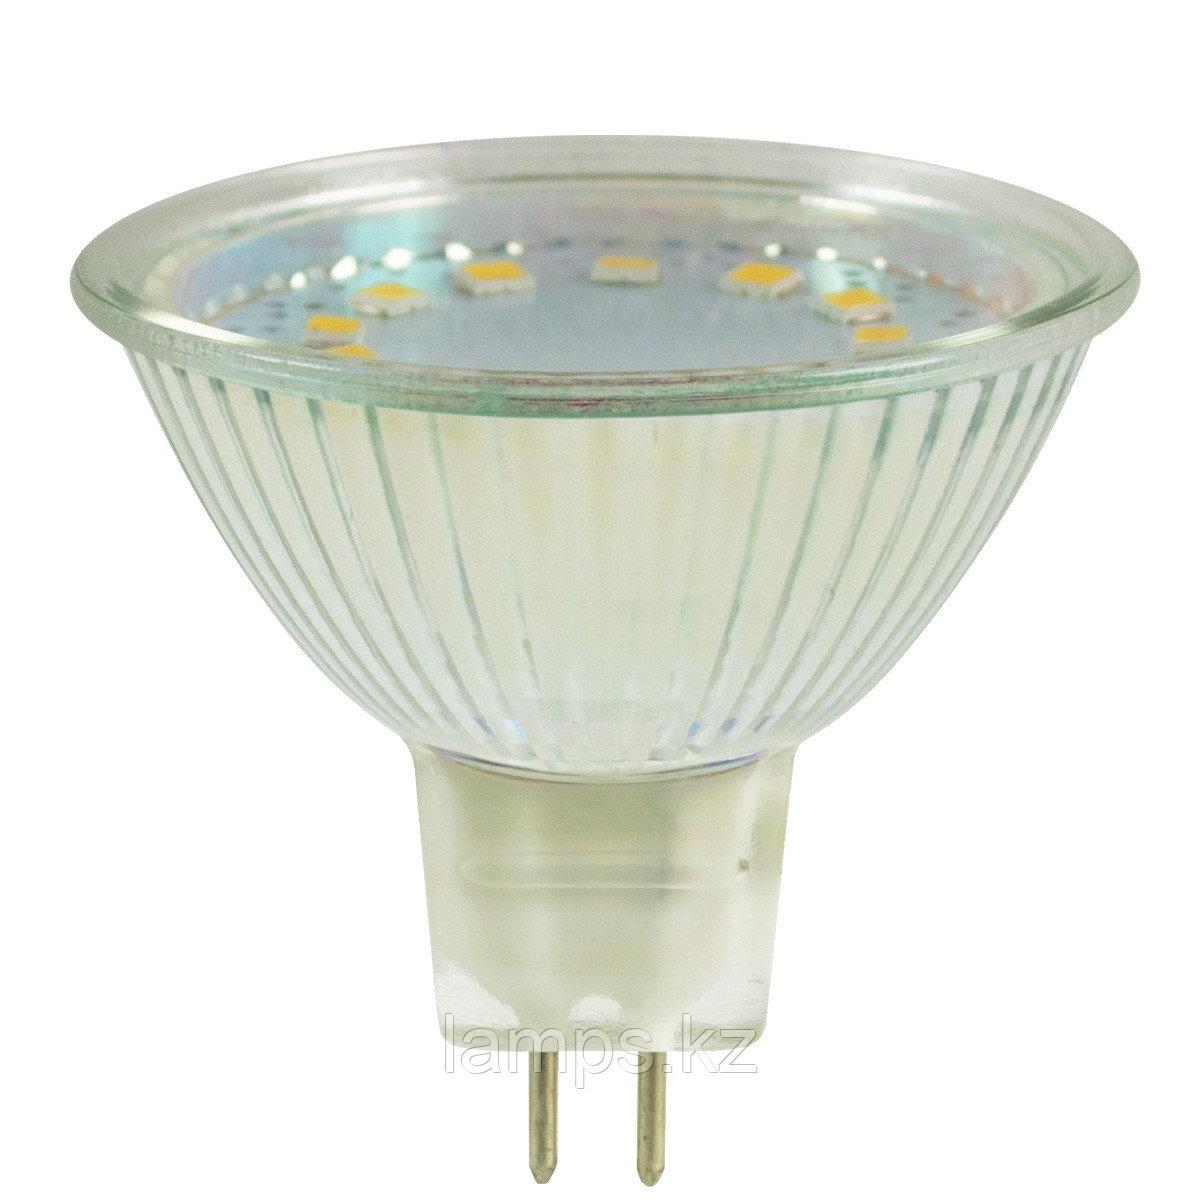 Светодиодная лампа LED MR16 3W 2700K